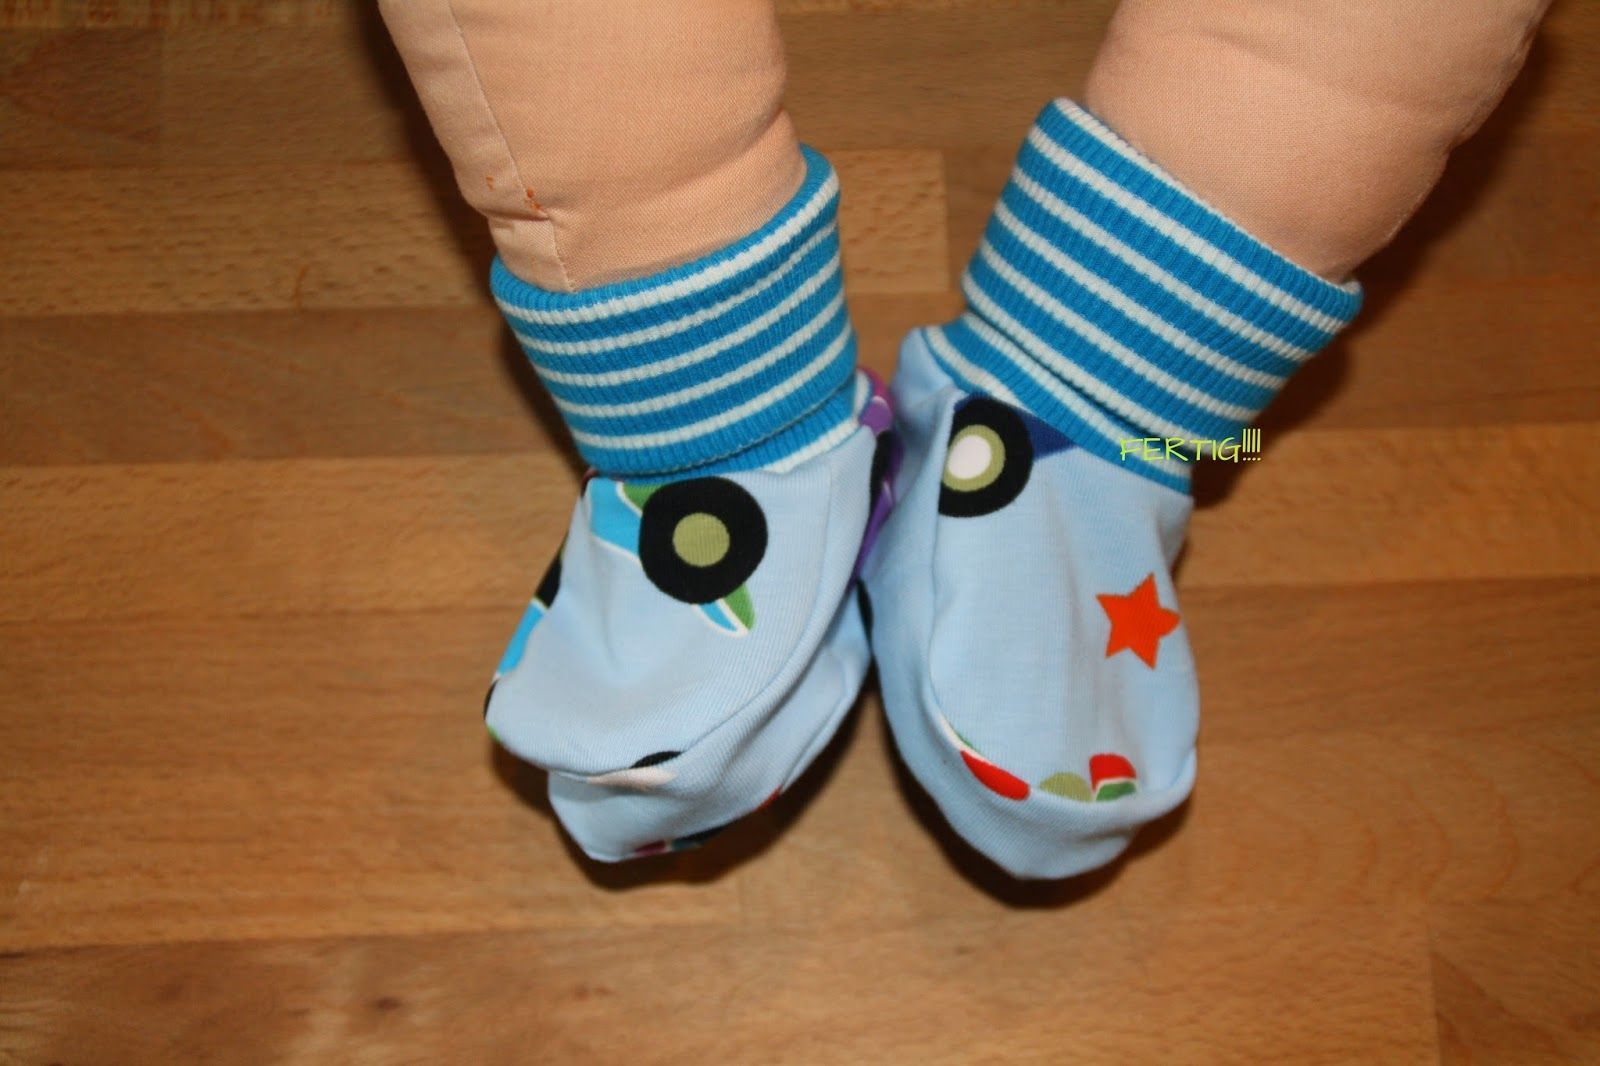 Baby Schuhe 365 Tage Sew Along, Babyschuh Tutorial, Babyschuhe ...